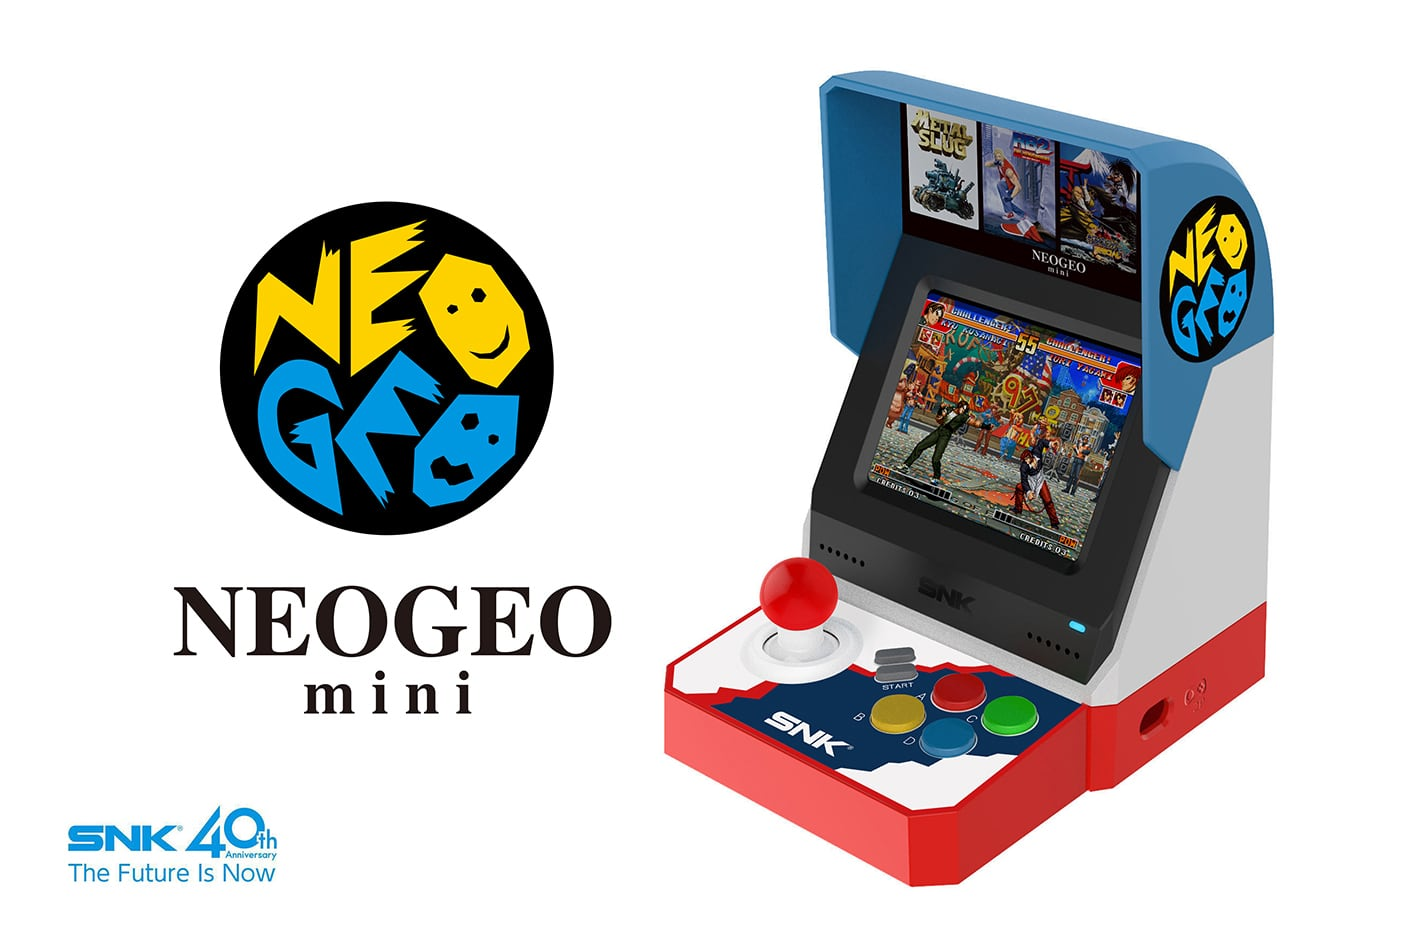 NEOGEO mini(ネオジオ ミニ)の画像